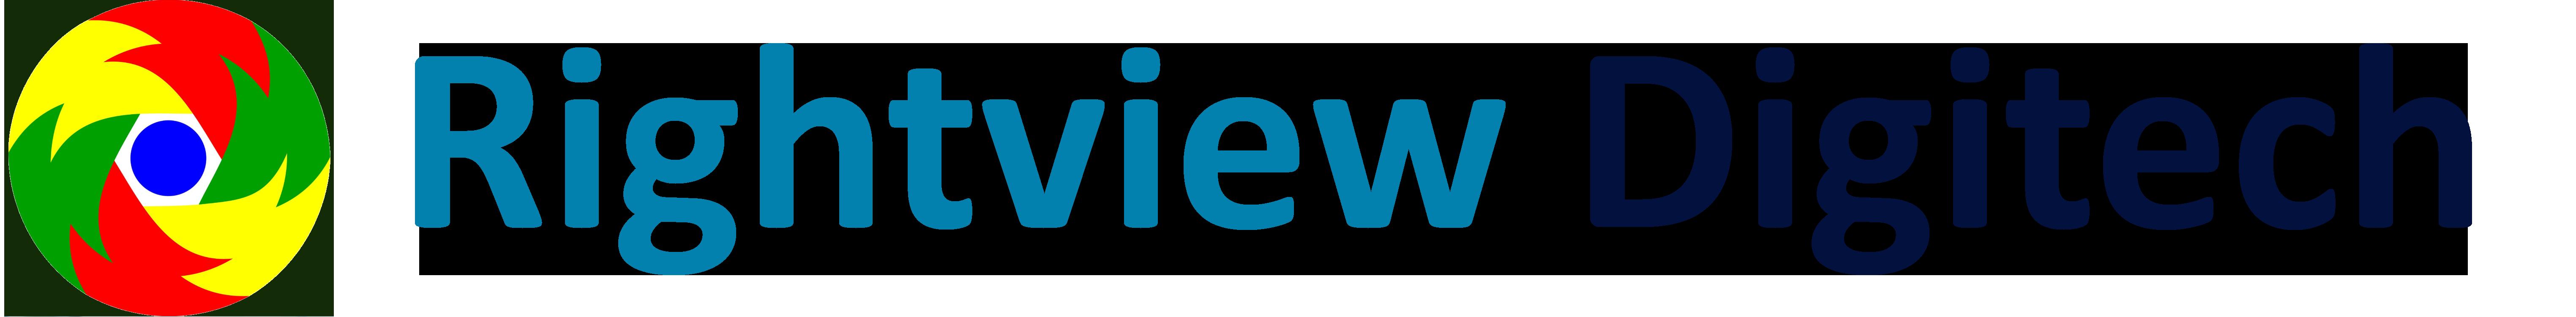 Rightview Digitech Pvt Ltd - Digital Marketing company logo